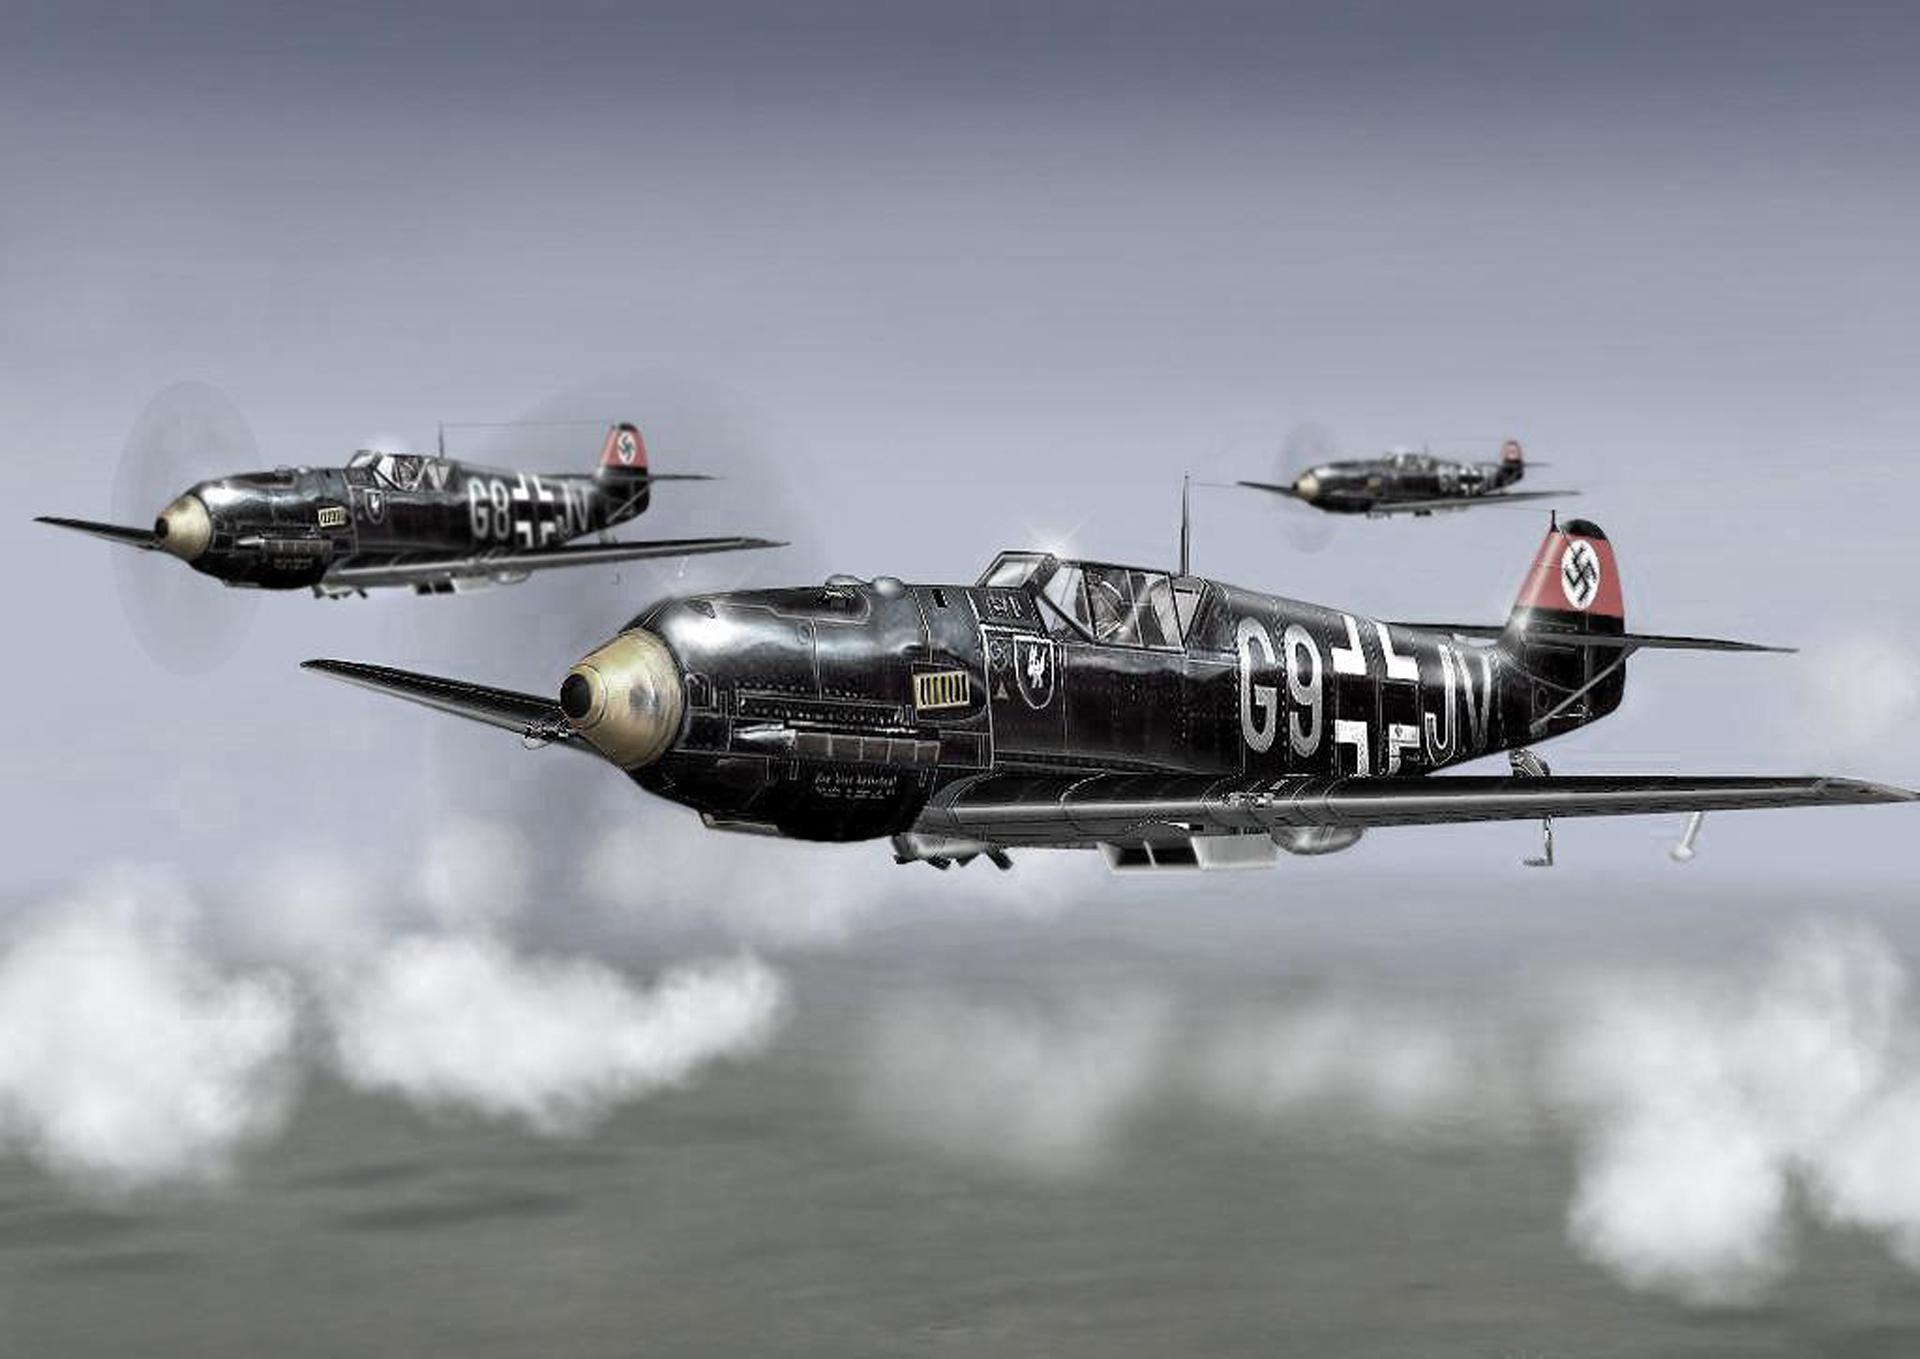 Germany world war ii luftwaffe planes free wallpaper germany world war ii luftwaffe planes free wallpaper wallpaperjam altavistaventures Image collections